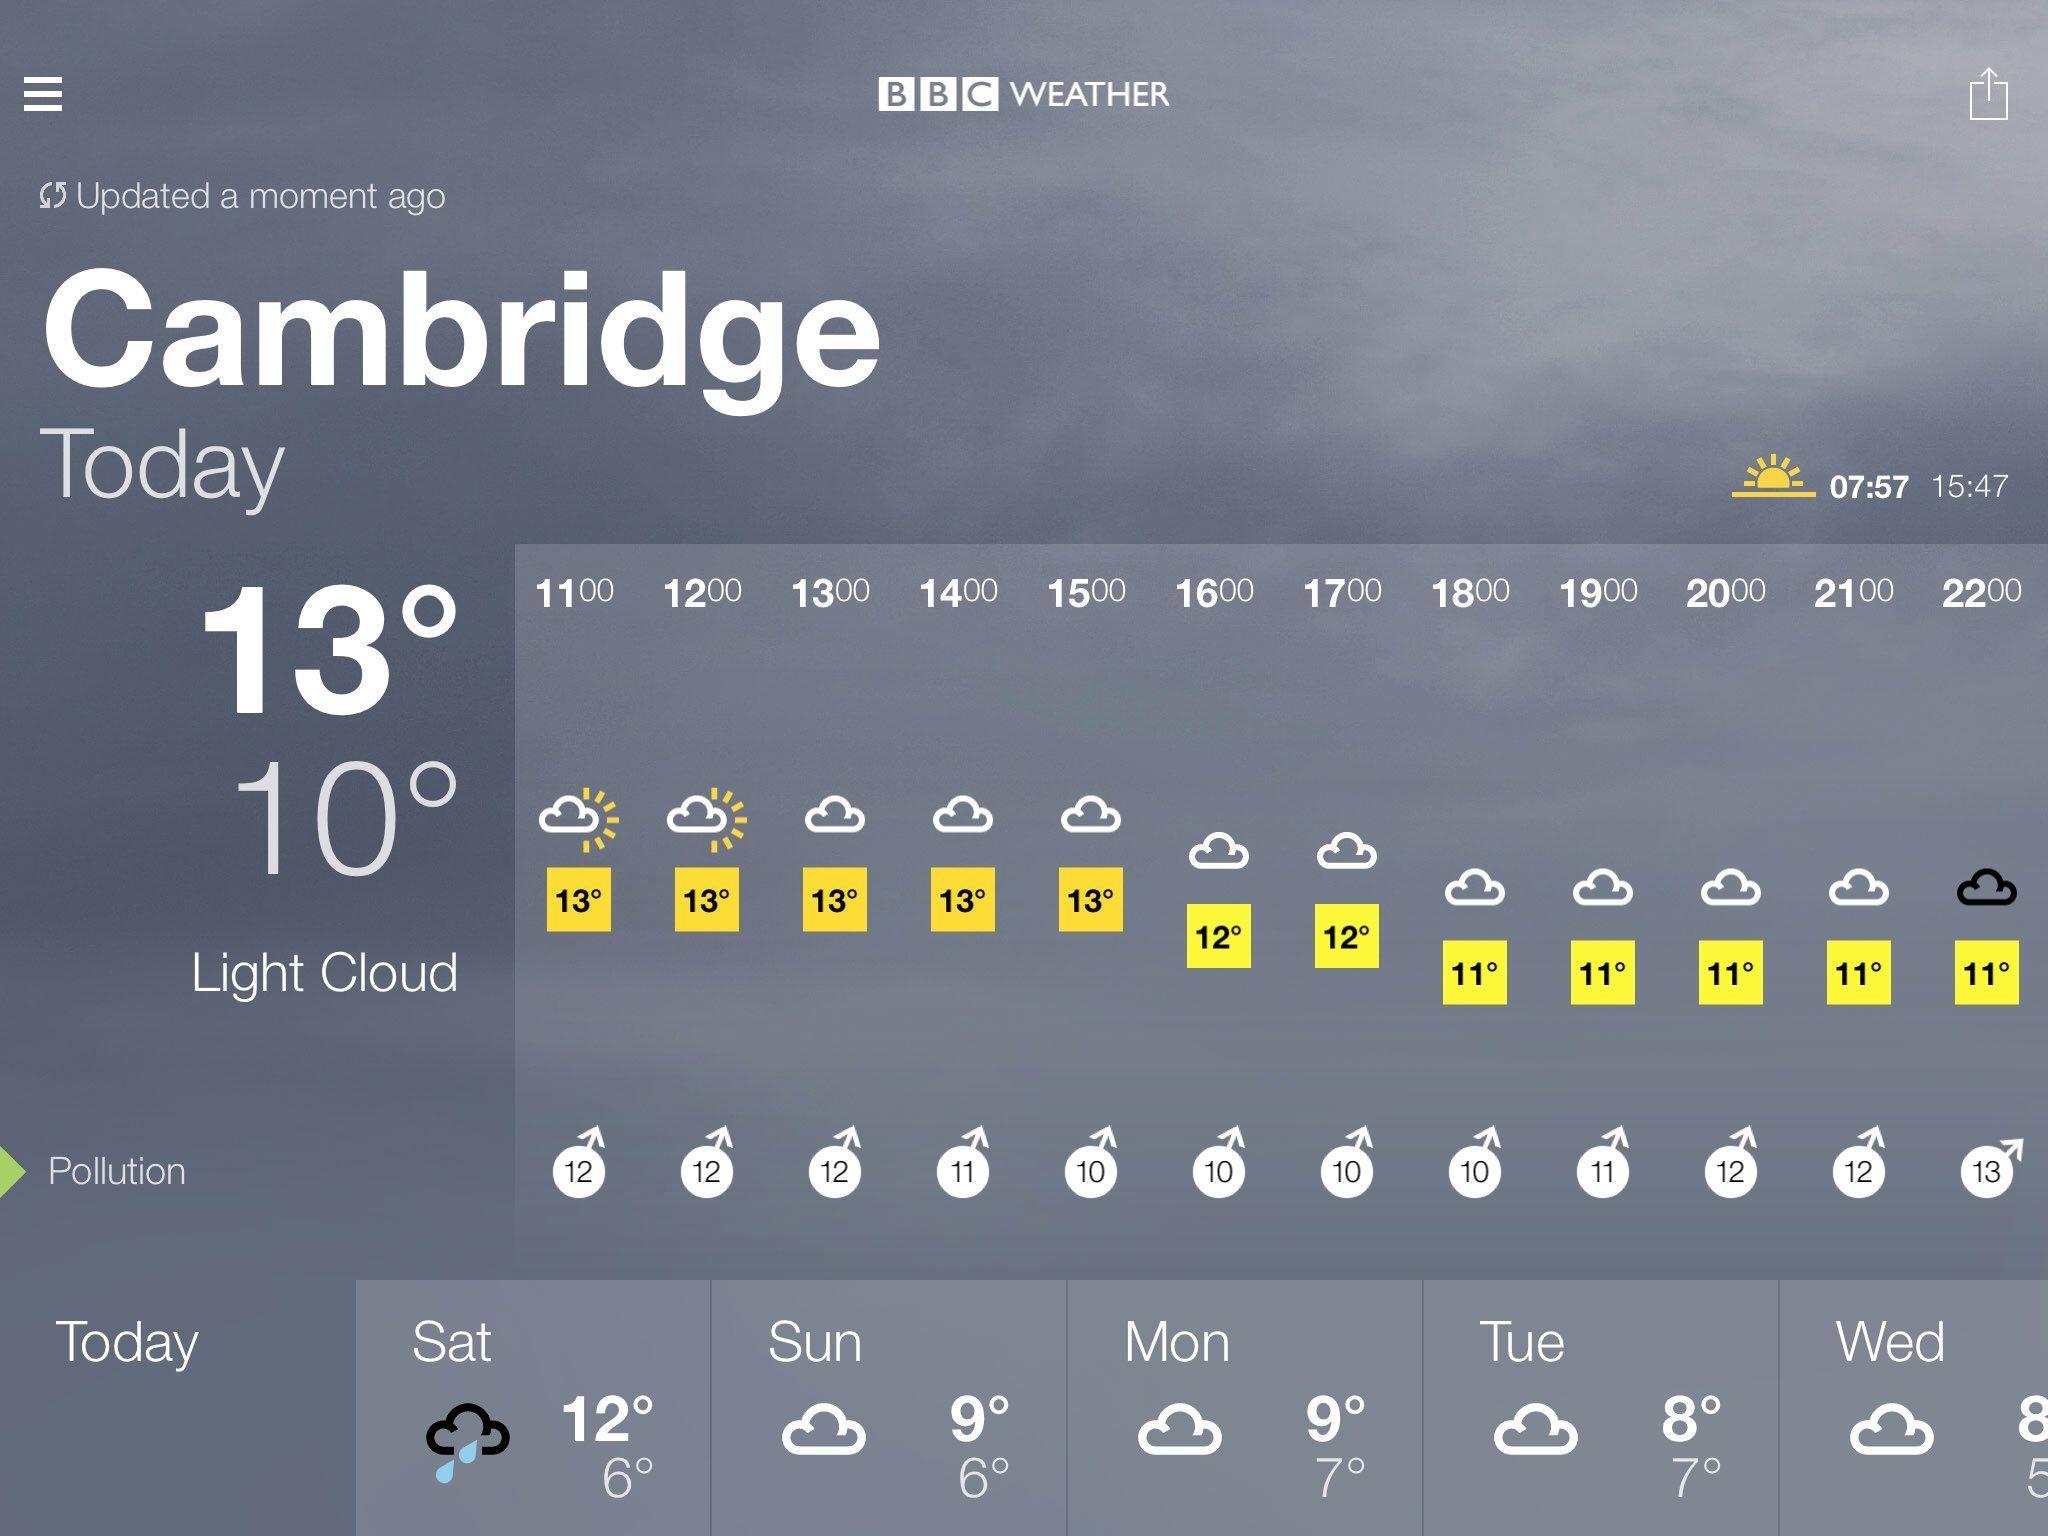 bbc weather forecast for cambridge cambridgeshire today light